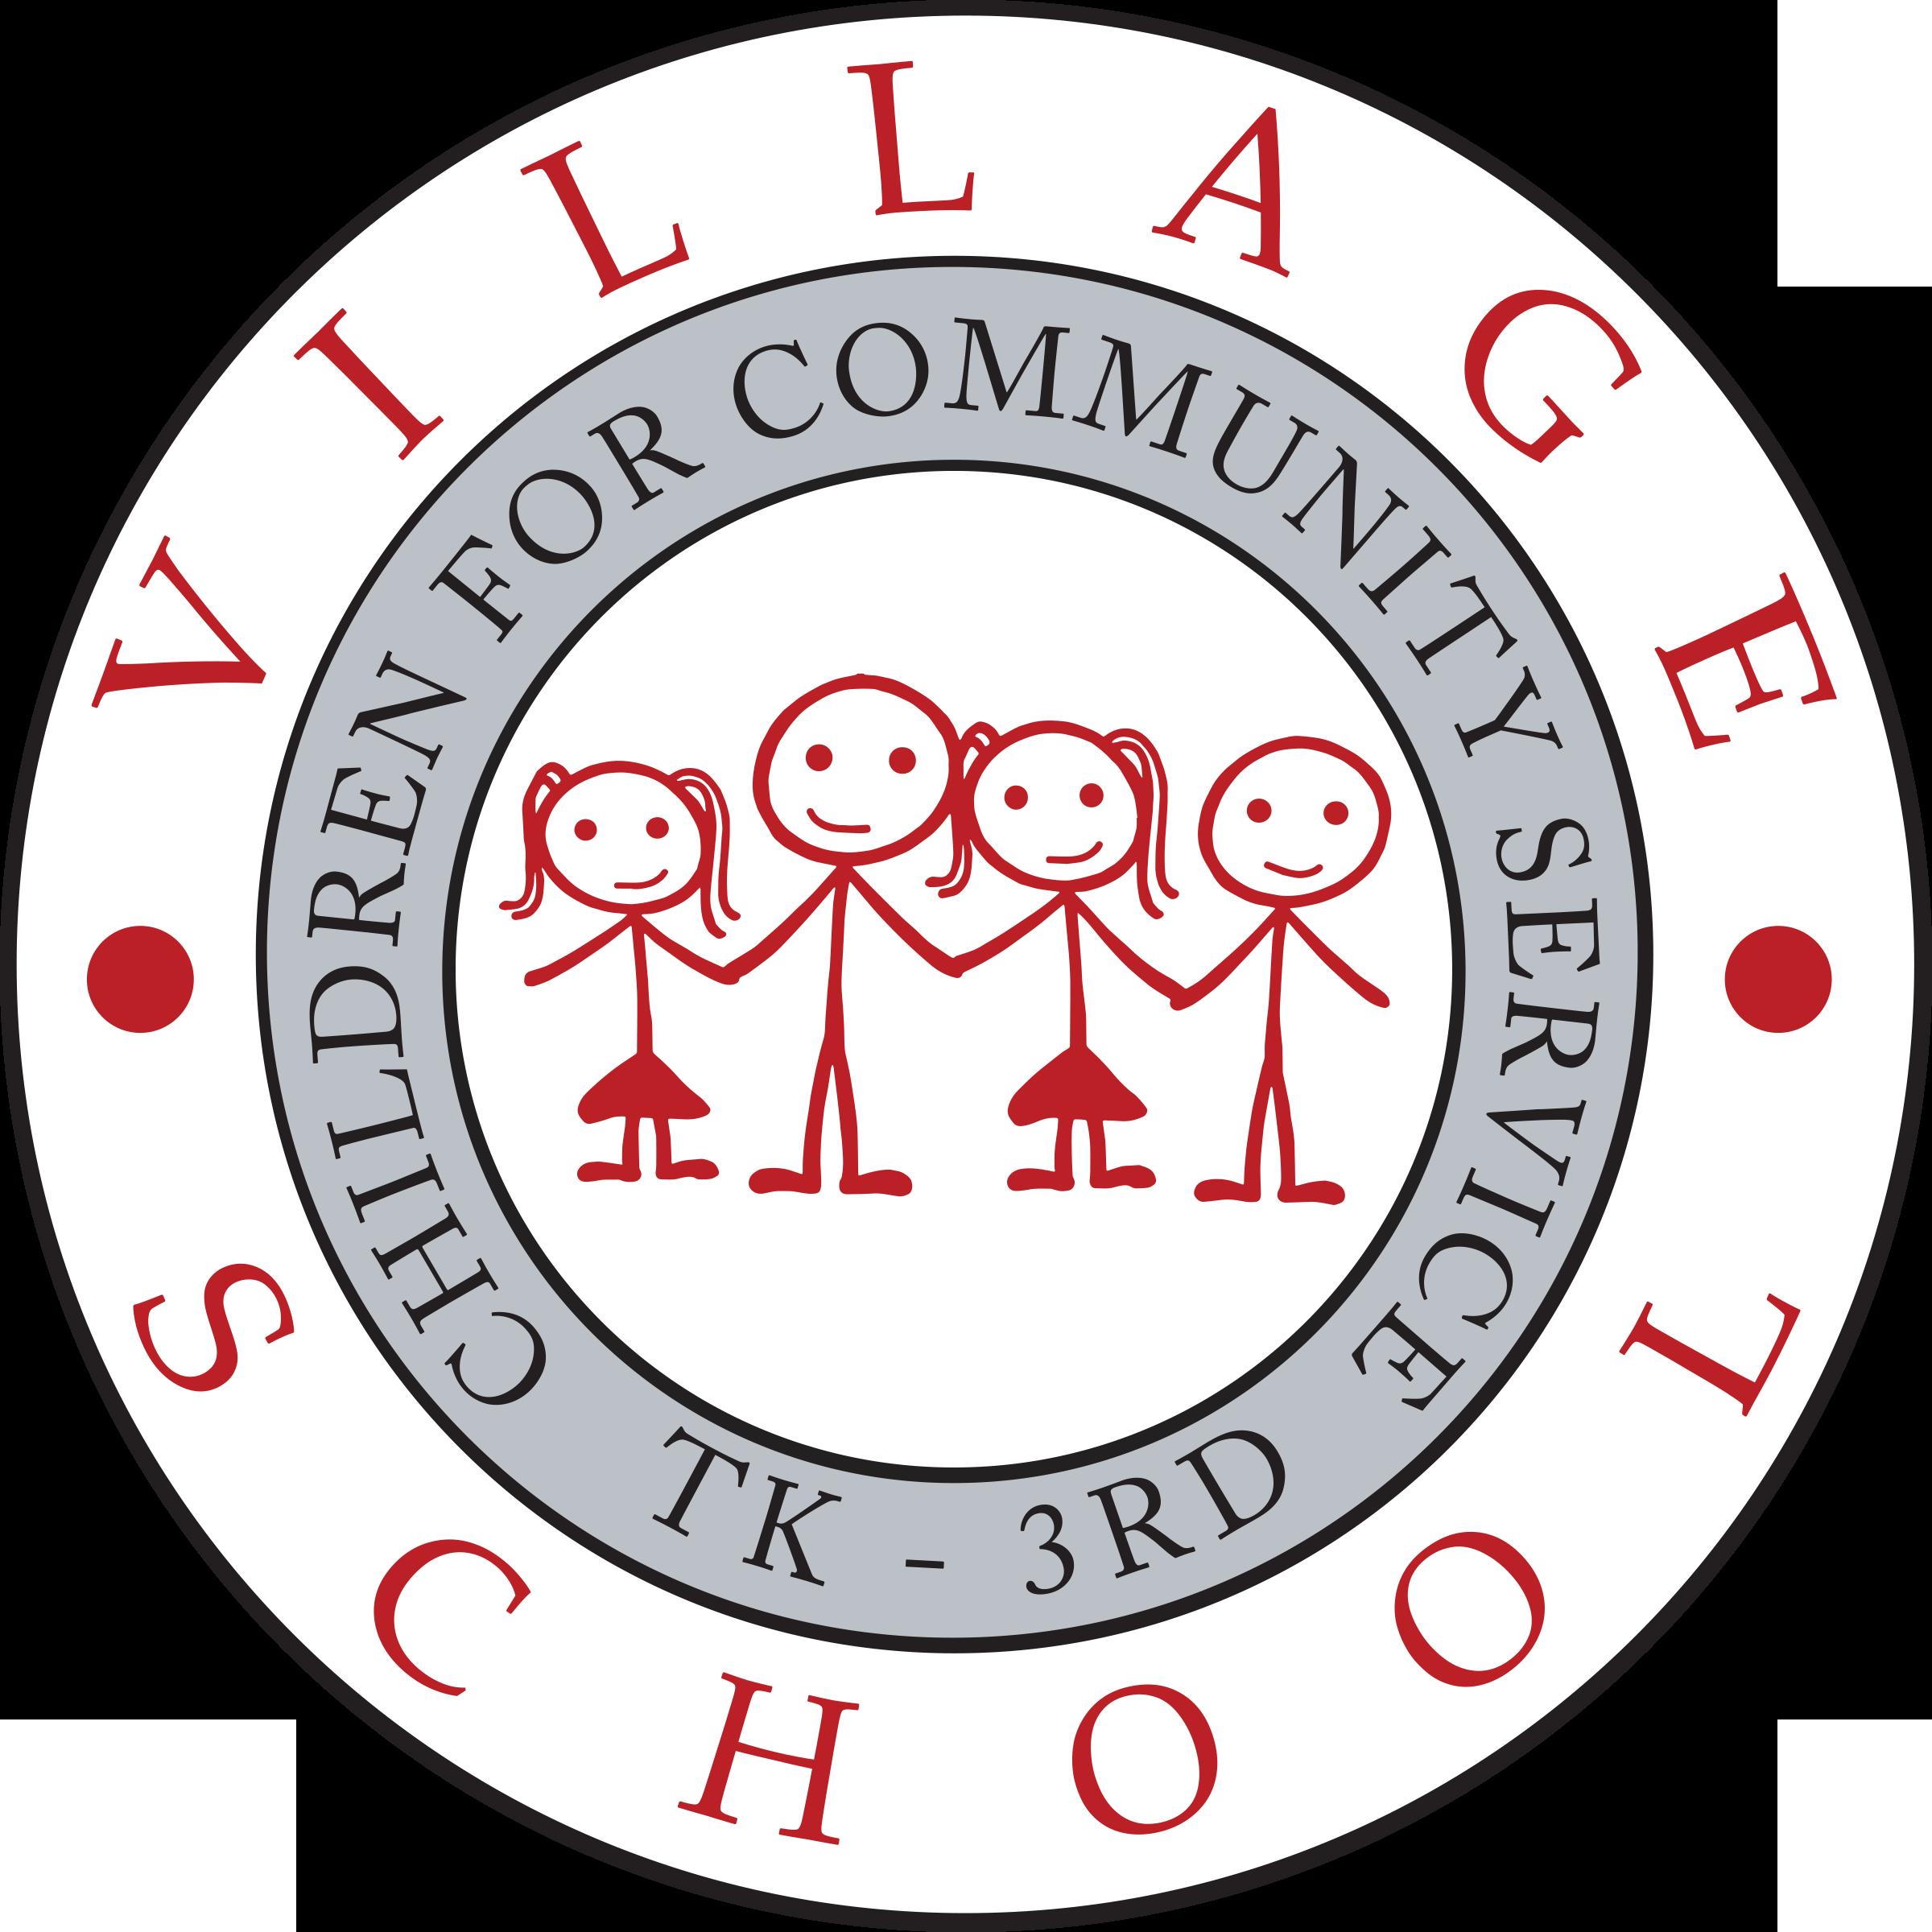 Community clipart village community. Service school cfcs logo